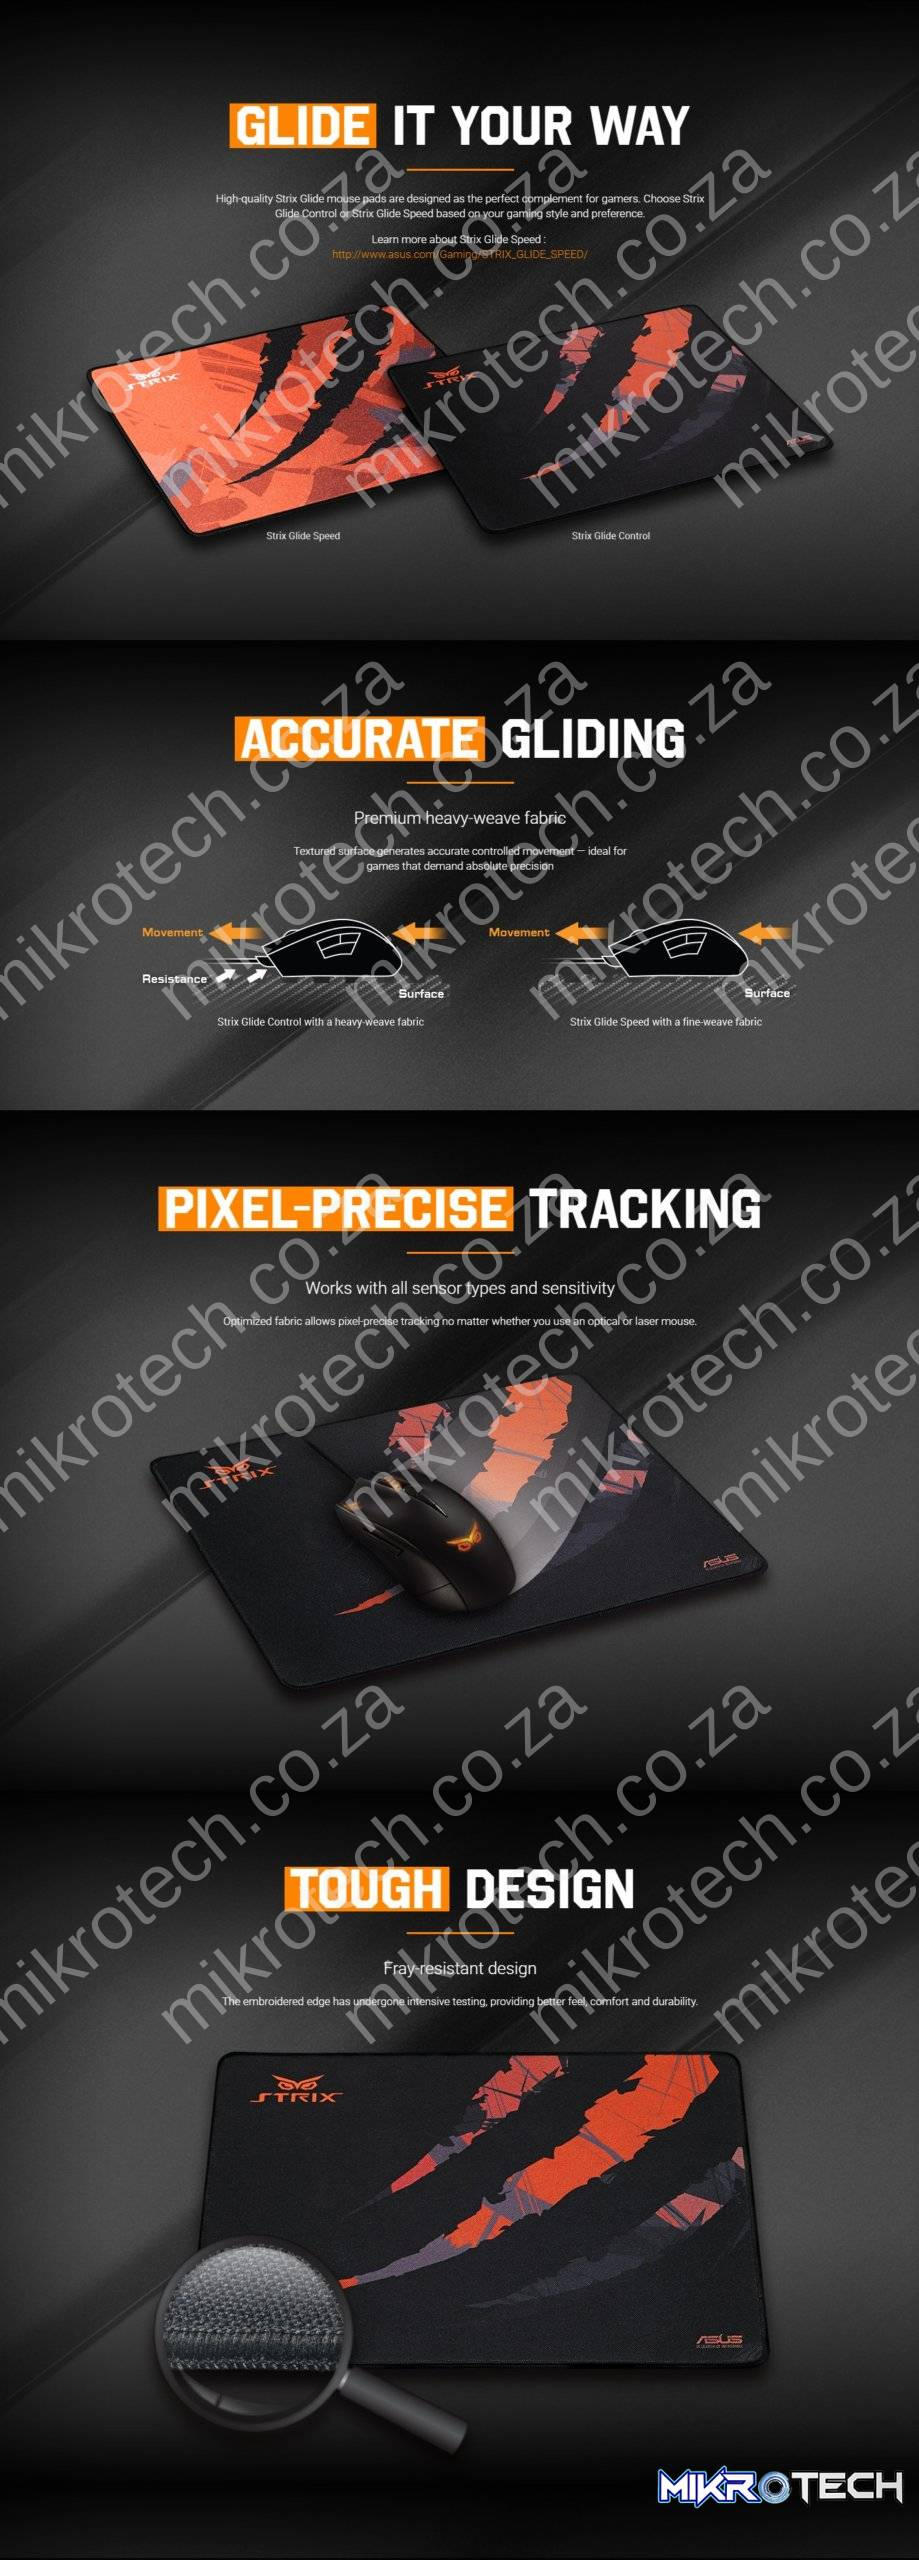 Asus STRIX Glide Control Mouse Pad